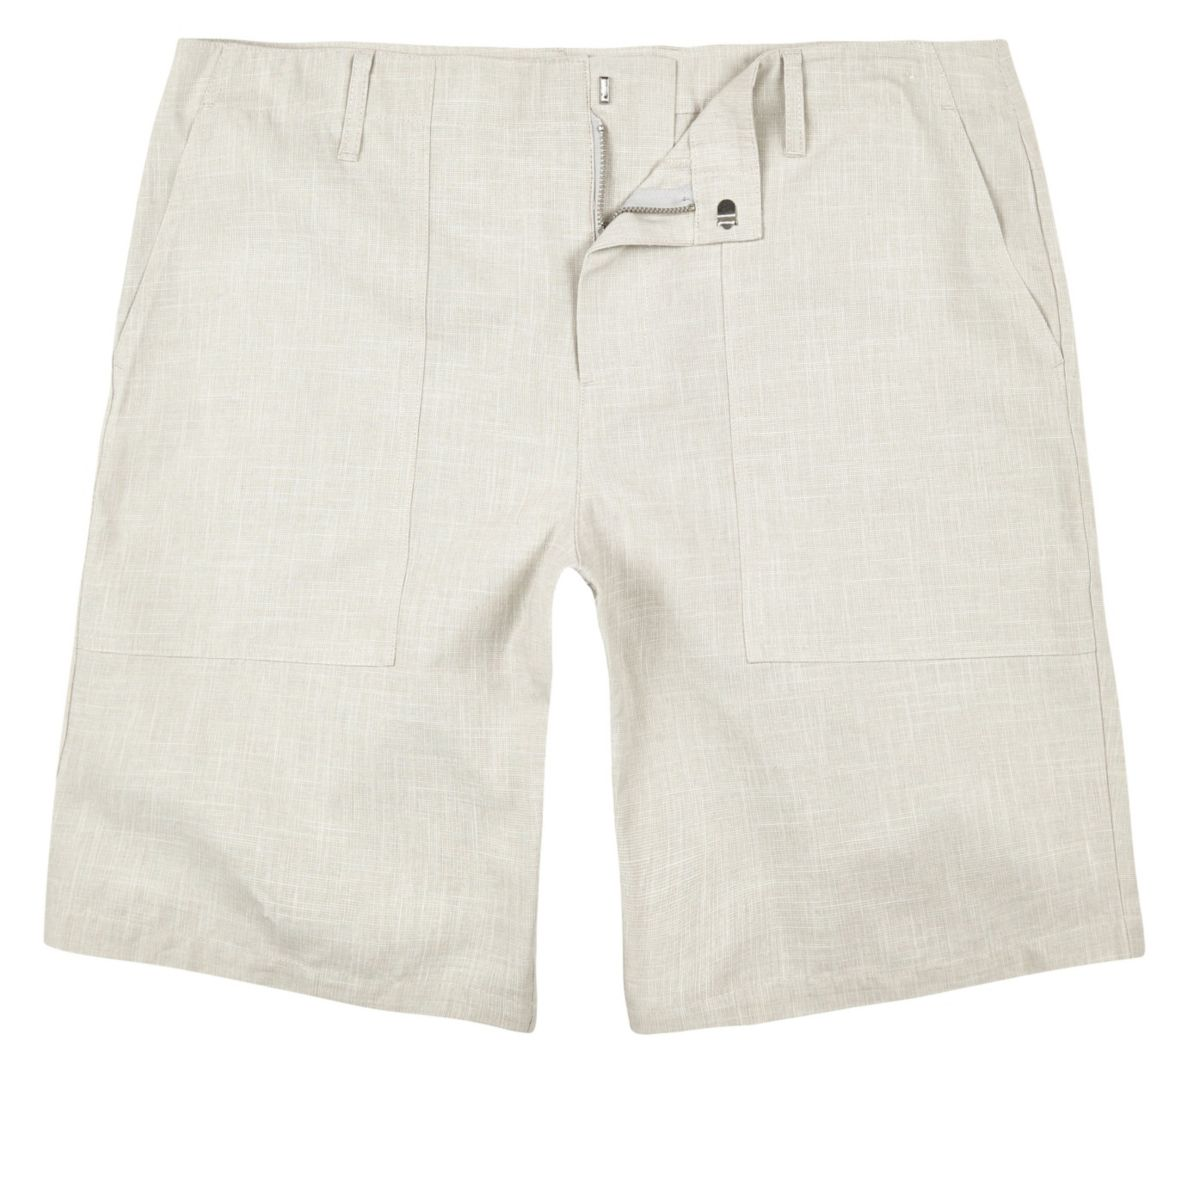 stone smart textured chino shorts - shorts - sale - men